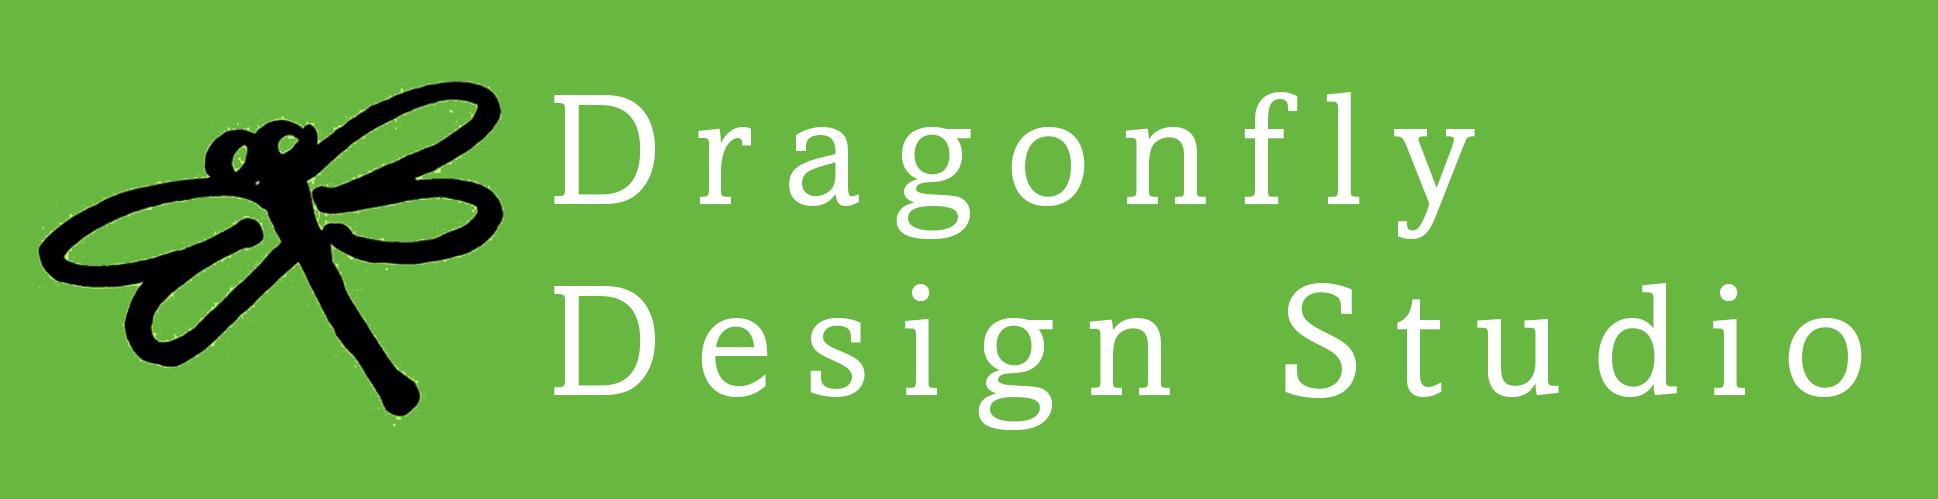 Dragonfly Design Studio